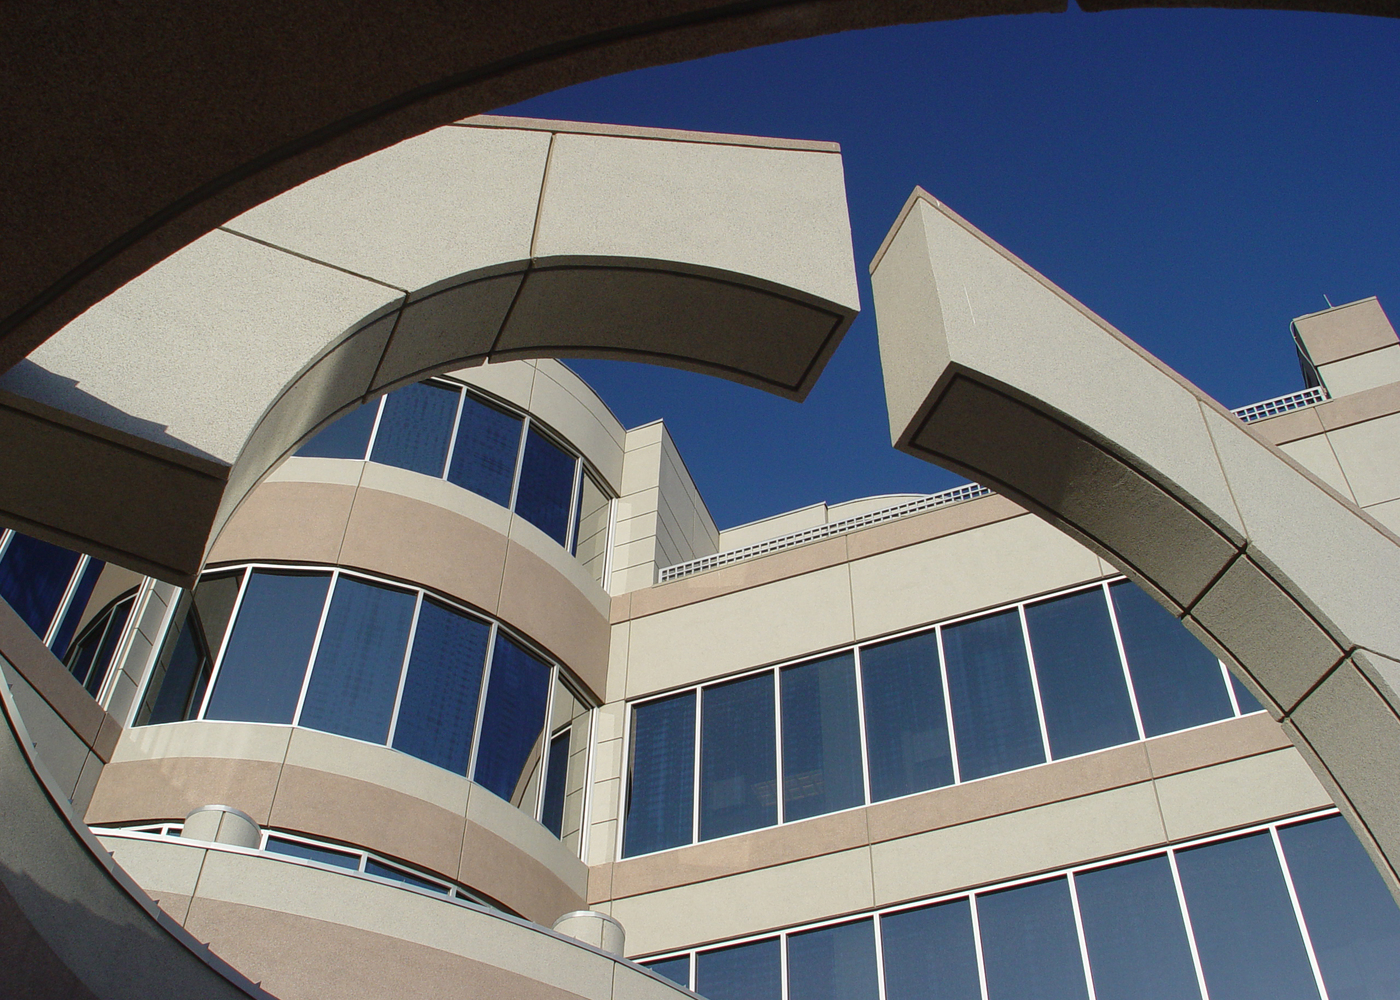 Architectural det. 7